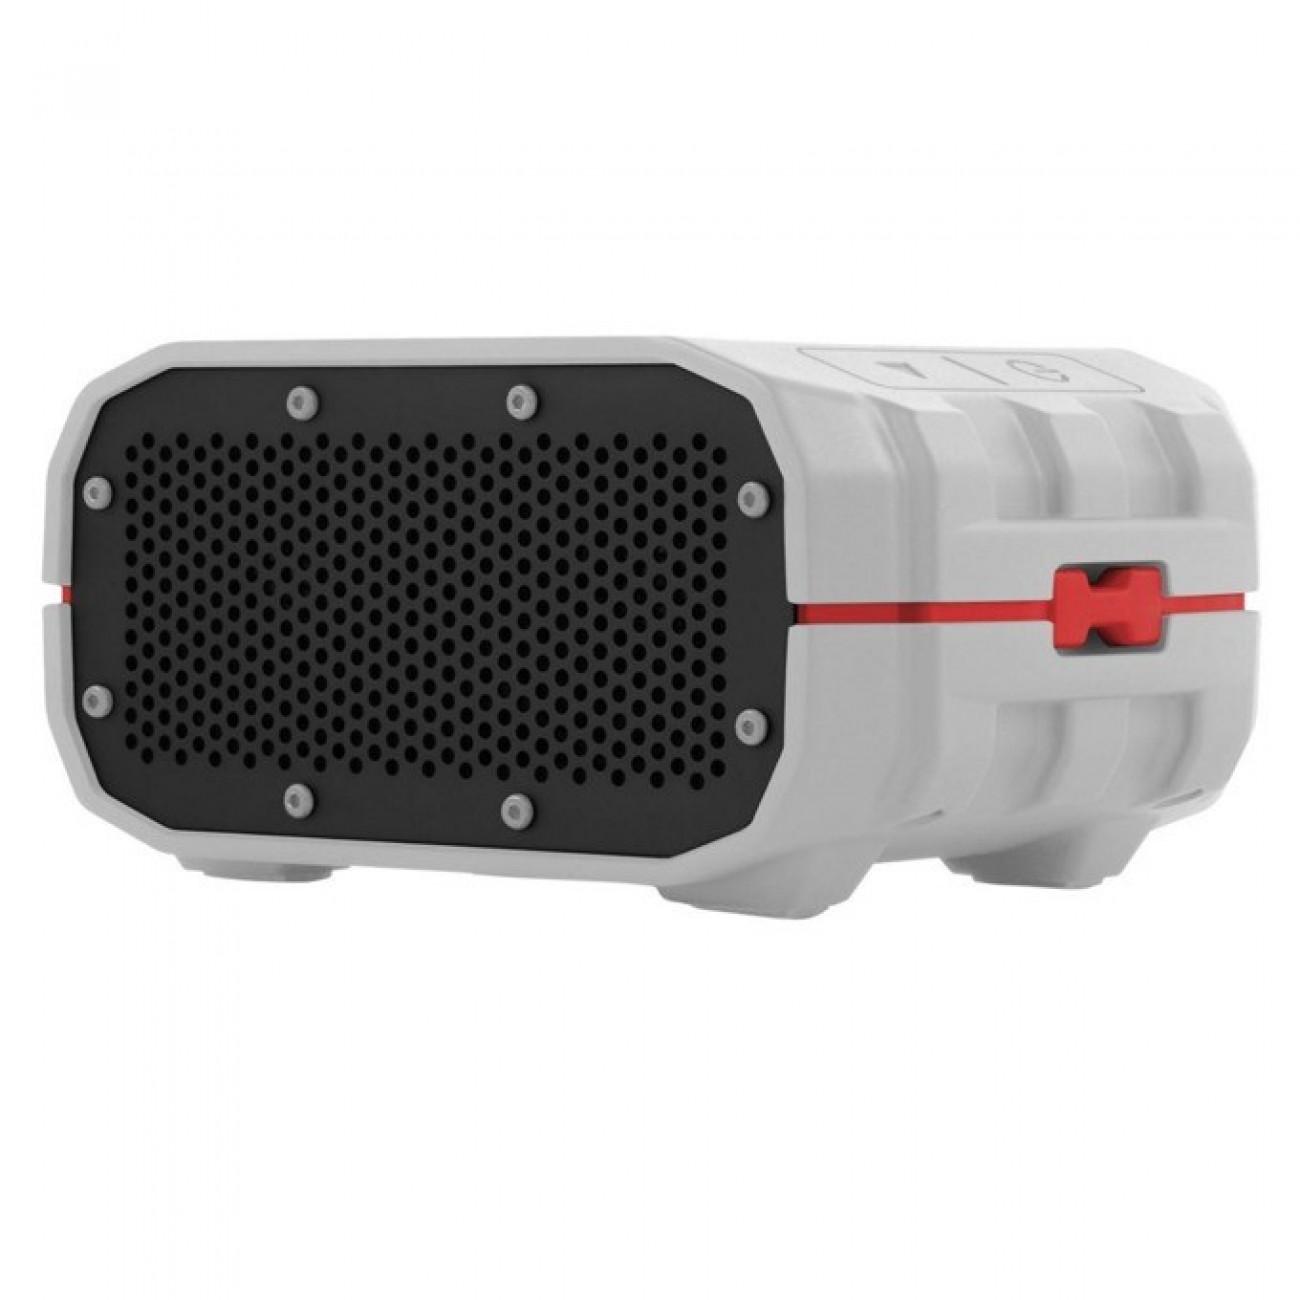 Тонколона Braven BRV-1, 1.0, RMS 3W, Bluetooth/USB, черна, водоустойчива IPX7 в Колони -    Alleop